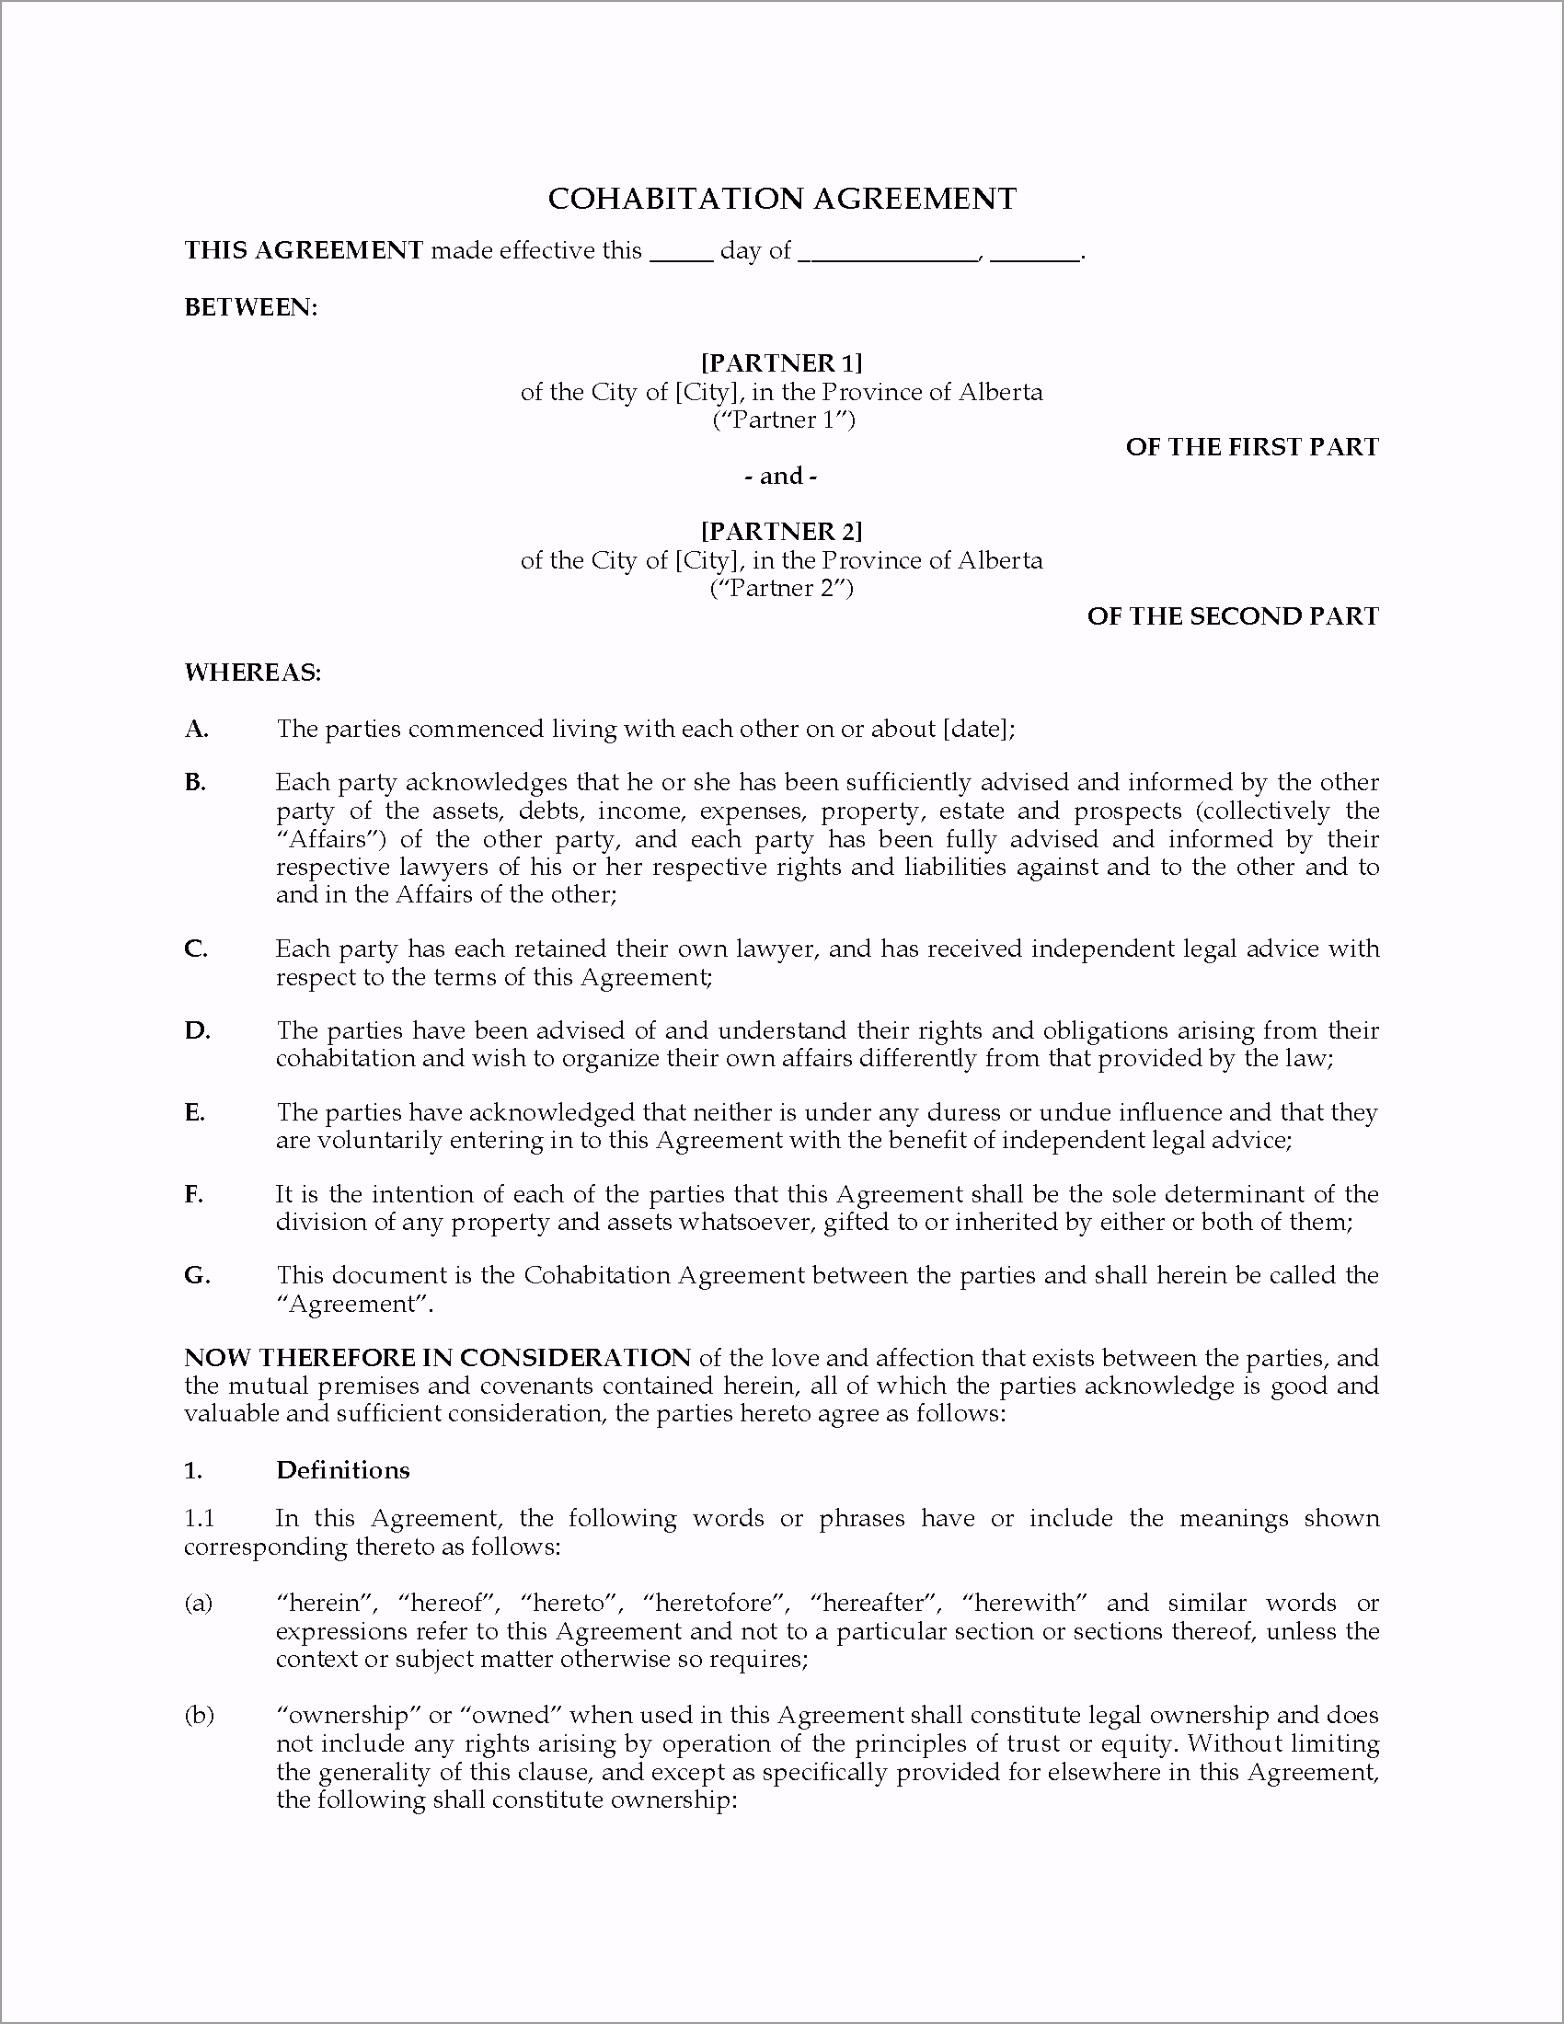 alberta cohabitation agreement reiiy